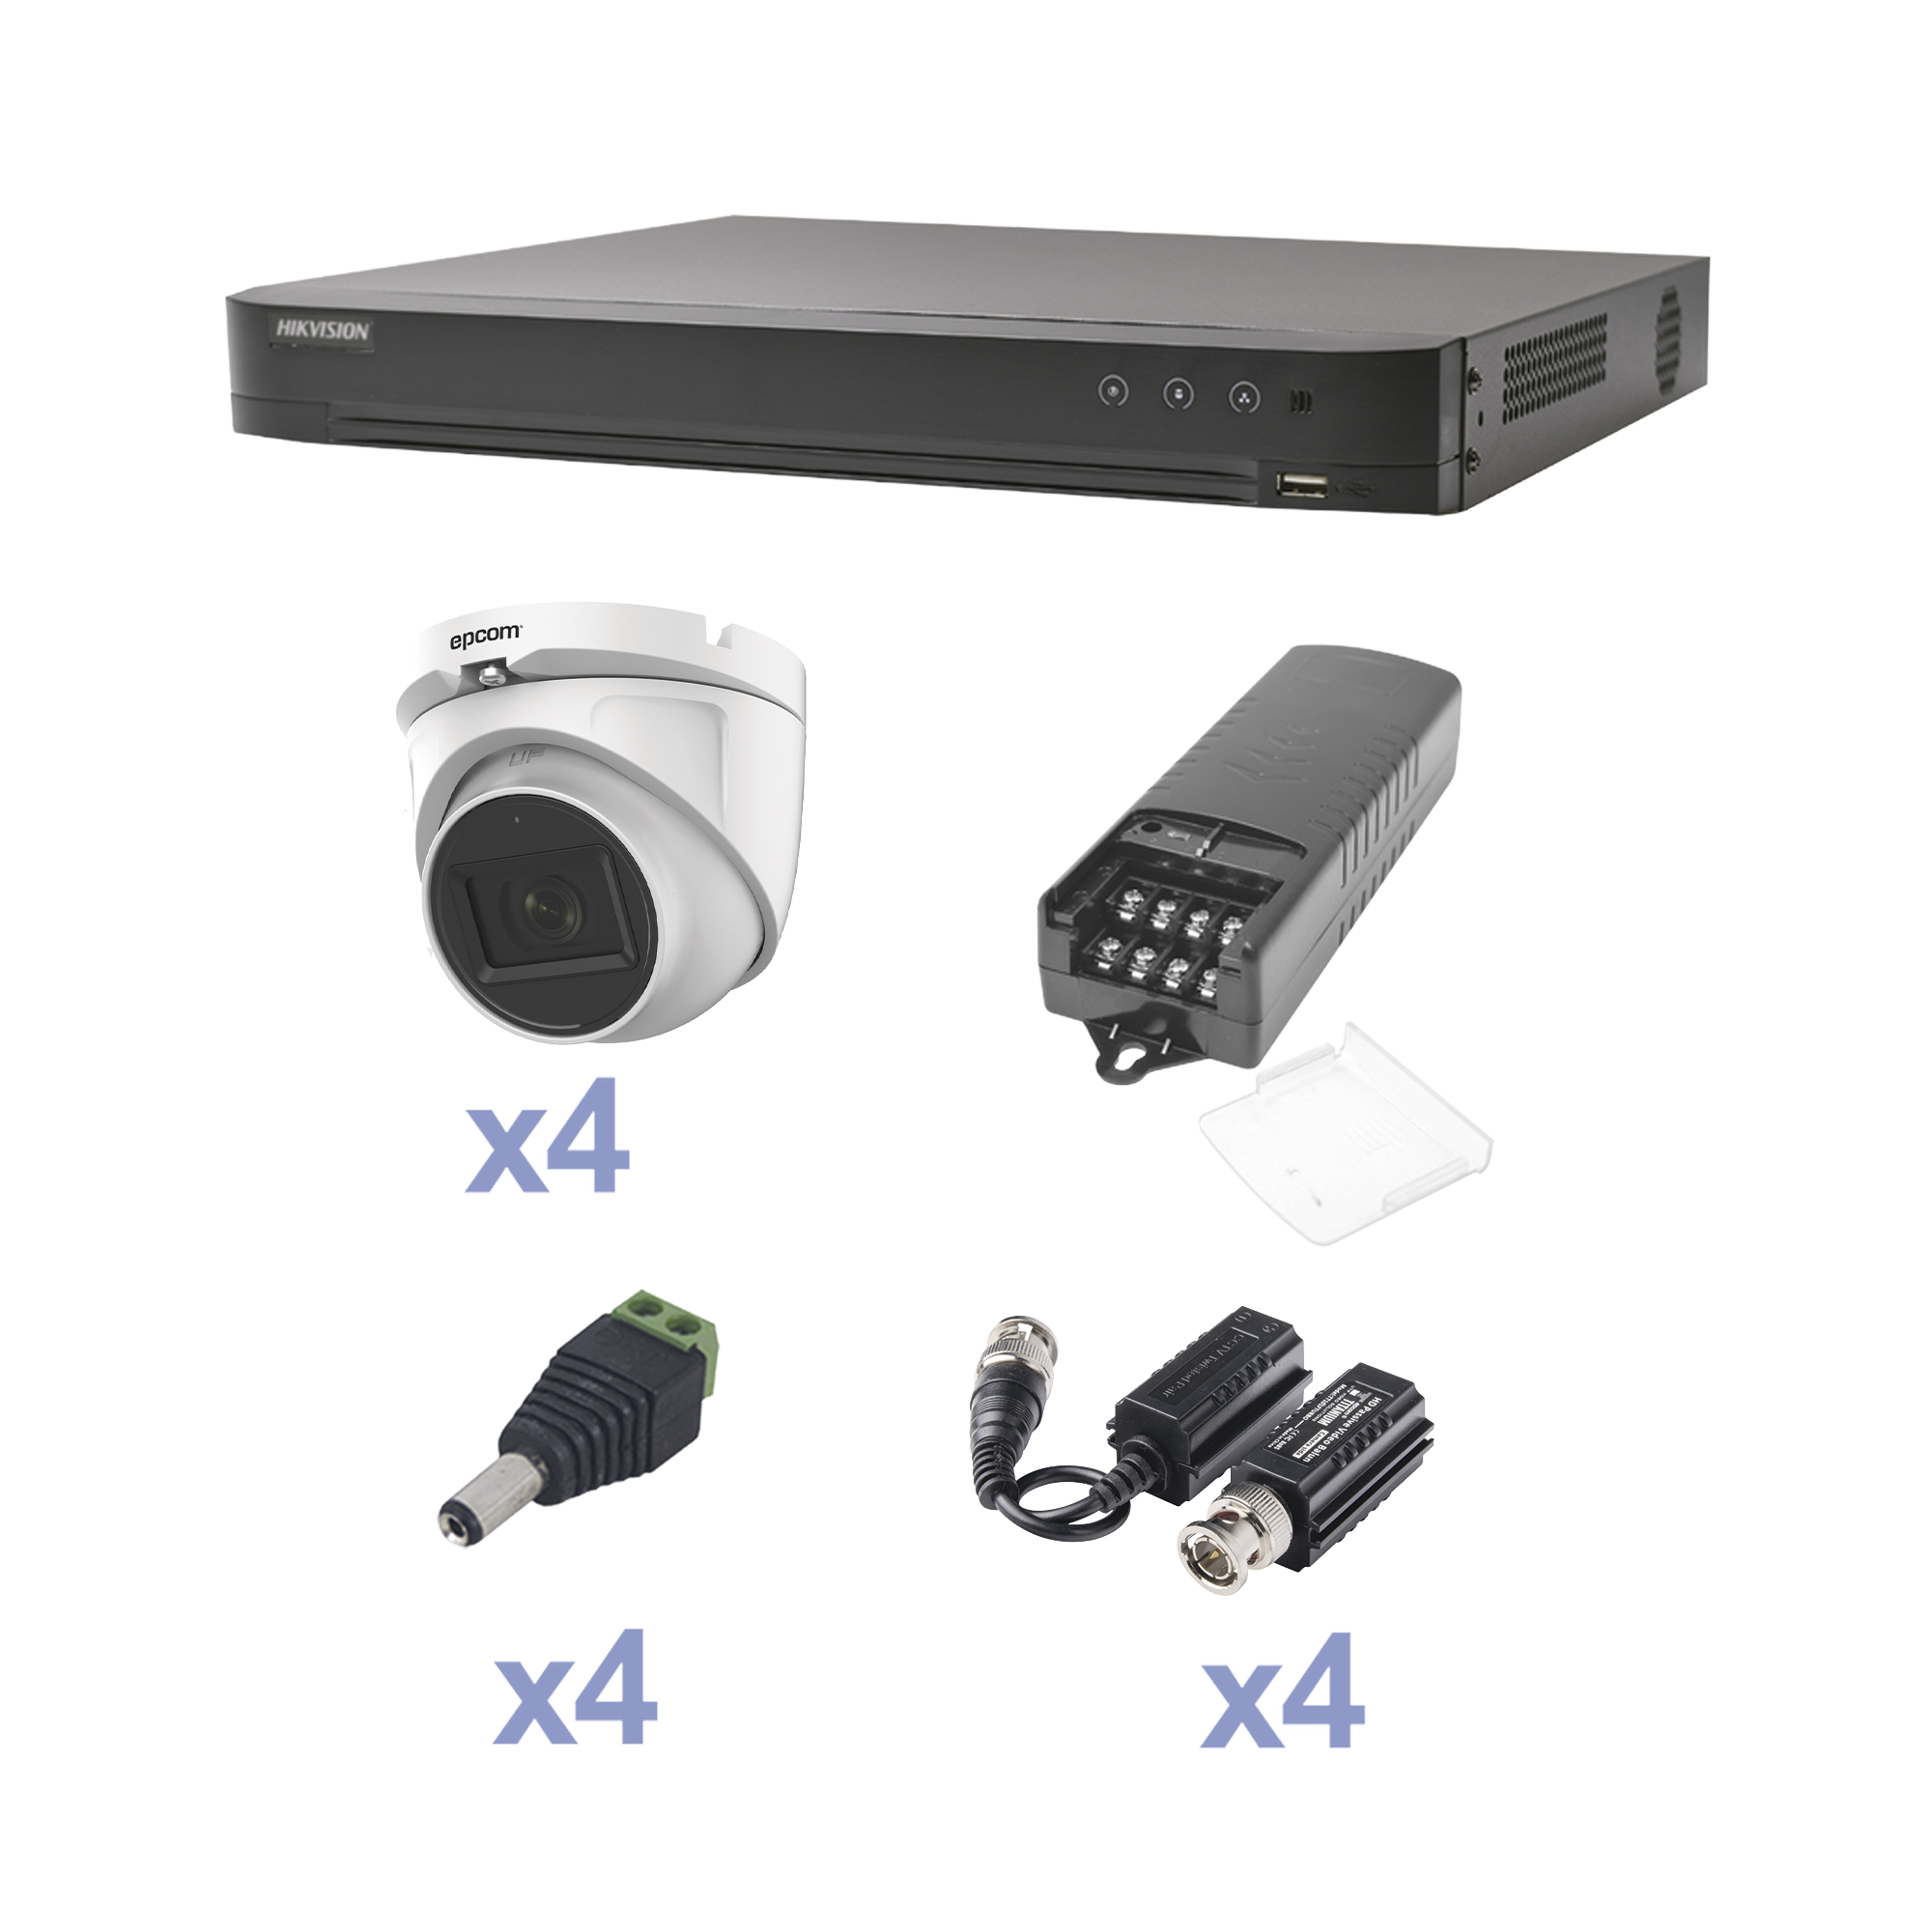 KIT TurboHD con Audio 1080p / DVR 4 Canales / 4 Cámaras Domo (exterior 2.8 mm) / Transceptores / Conectores / Fuente de Poder / AUDIO POR COAXITRON